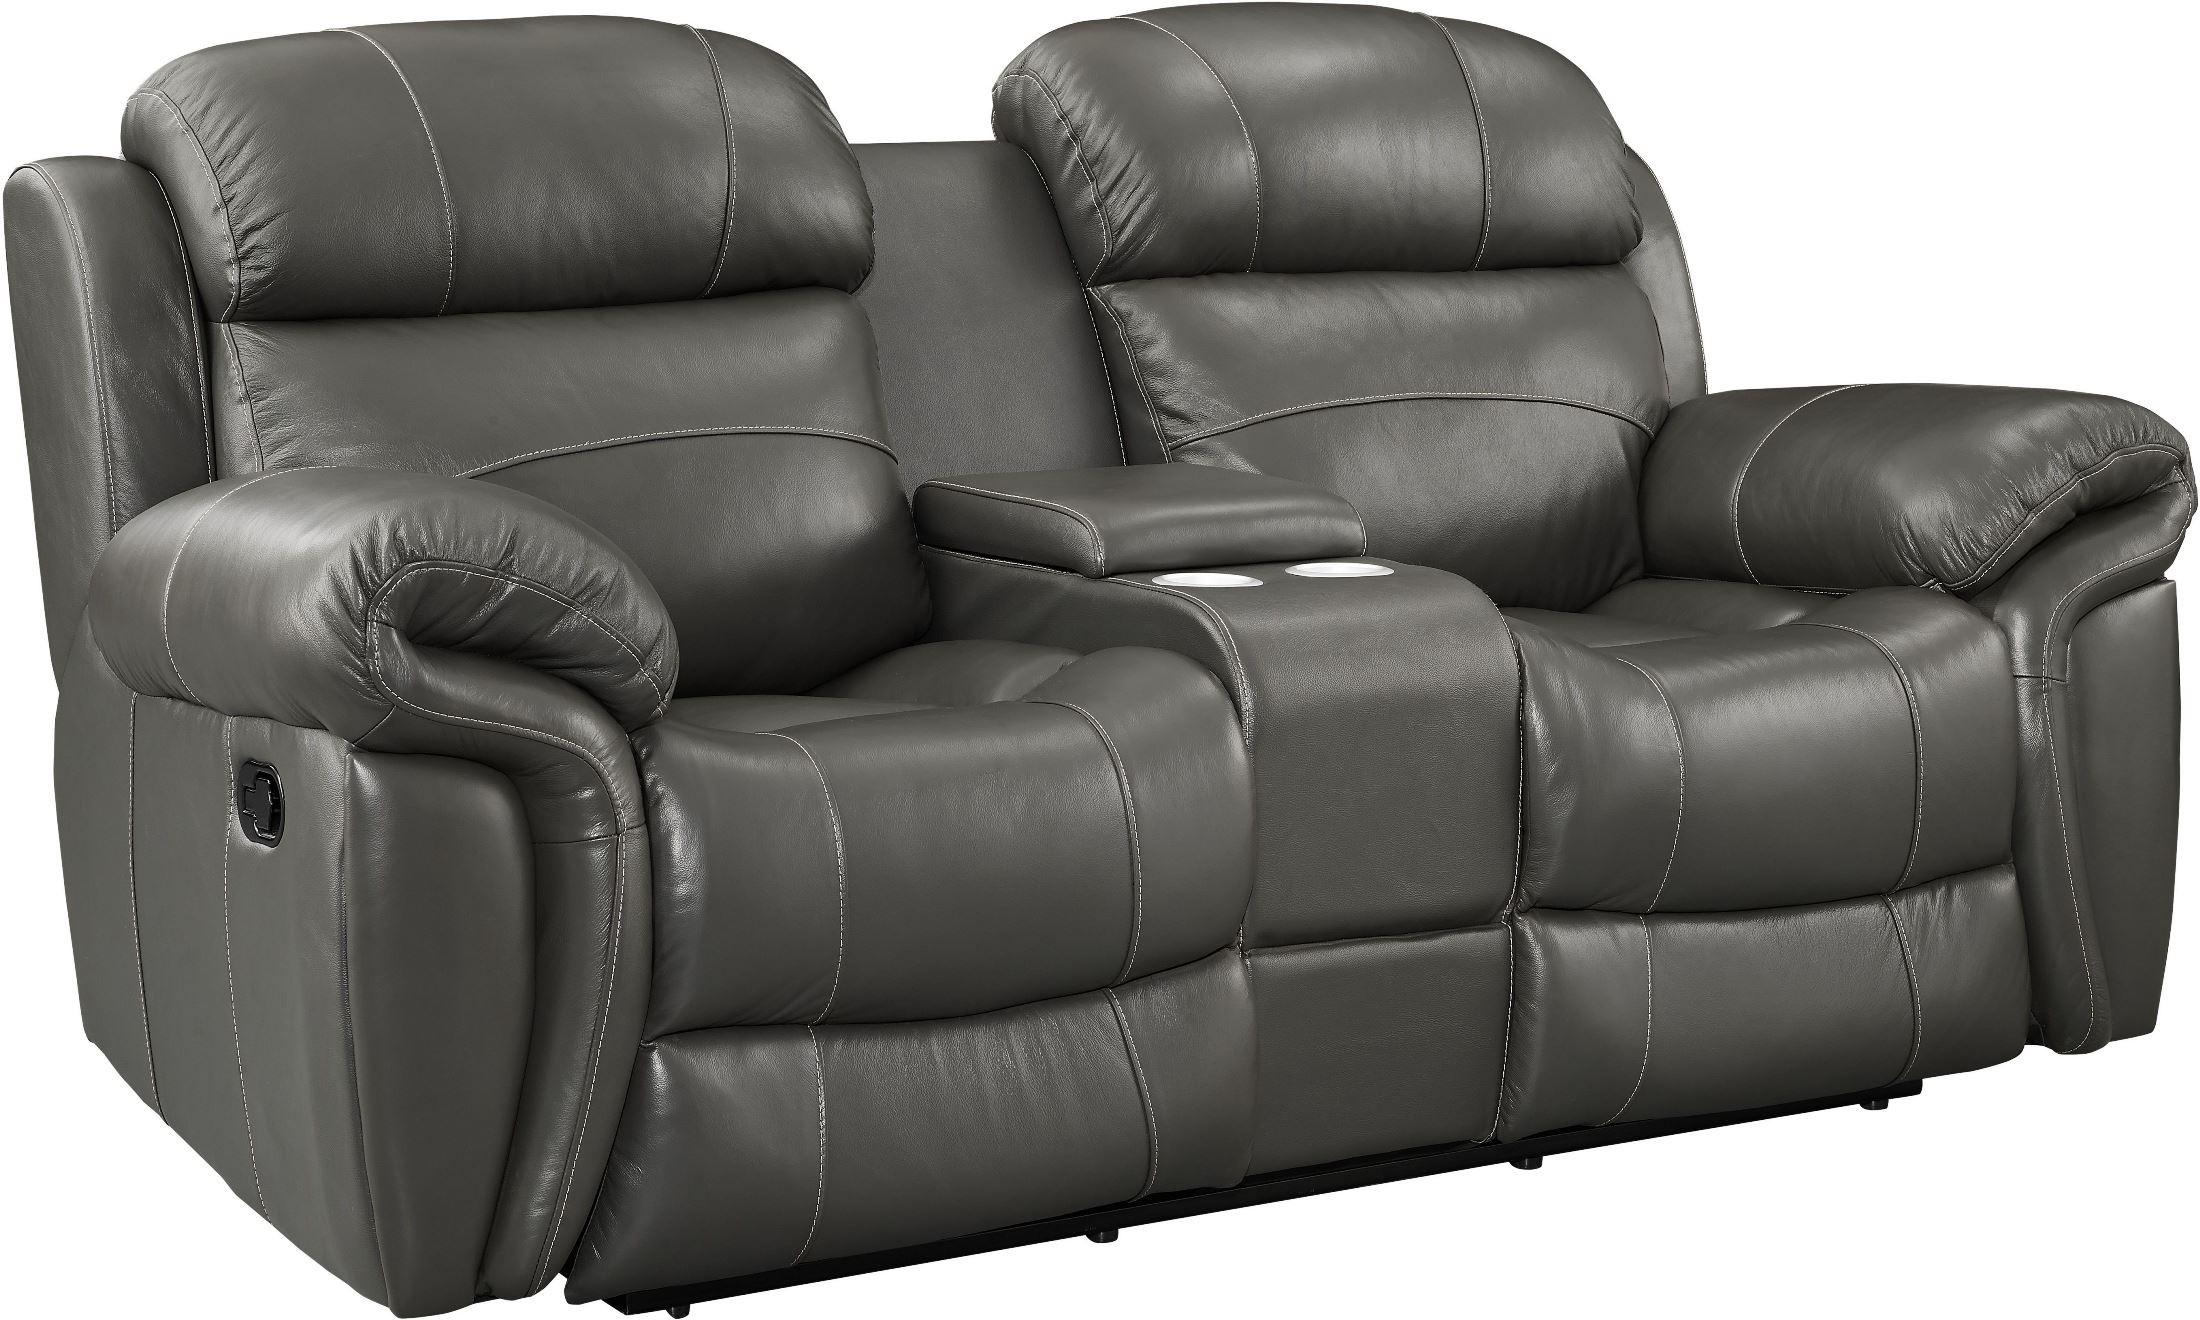 Paloma Gray Dual Reclining Living Room Set L2655 30 Lgy New Classics